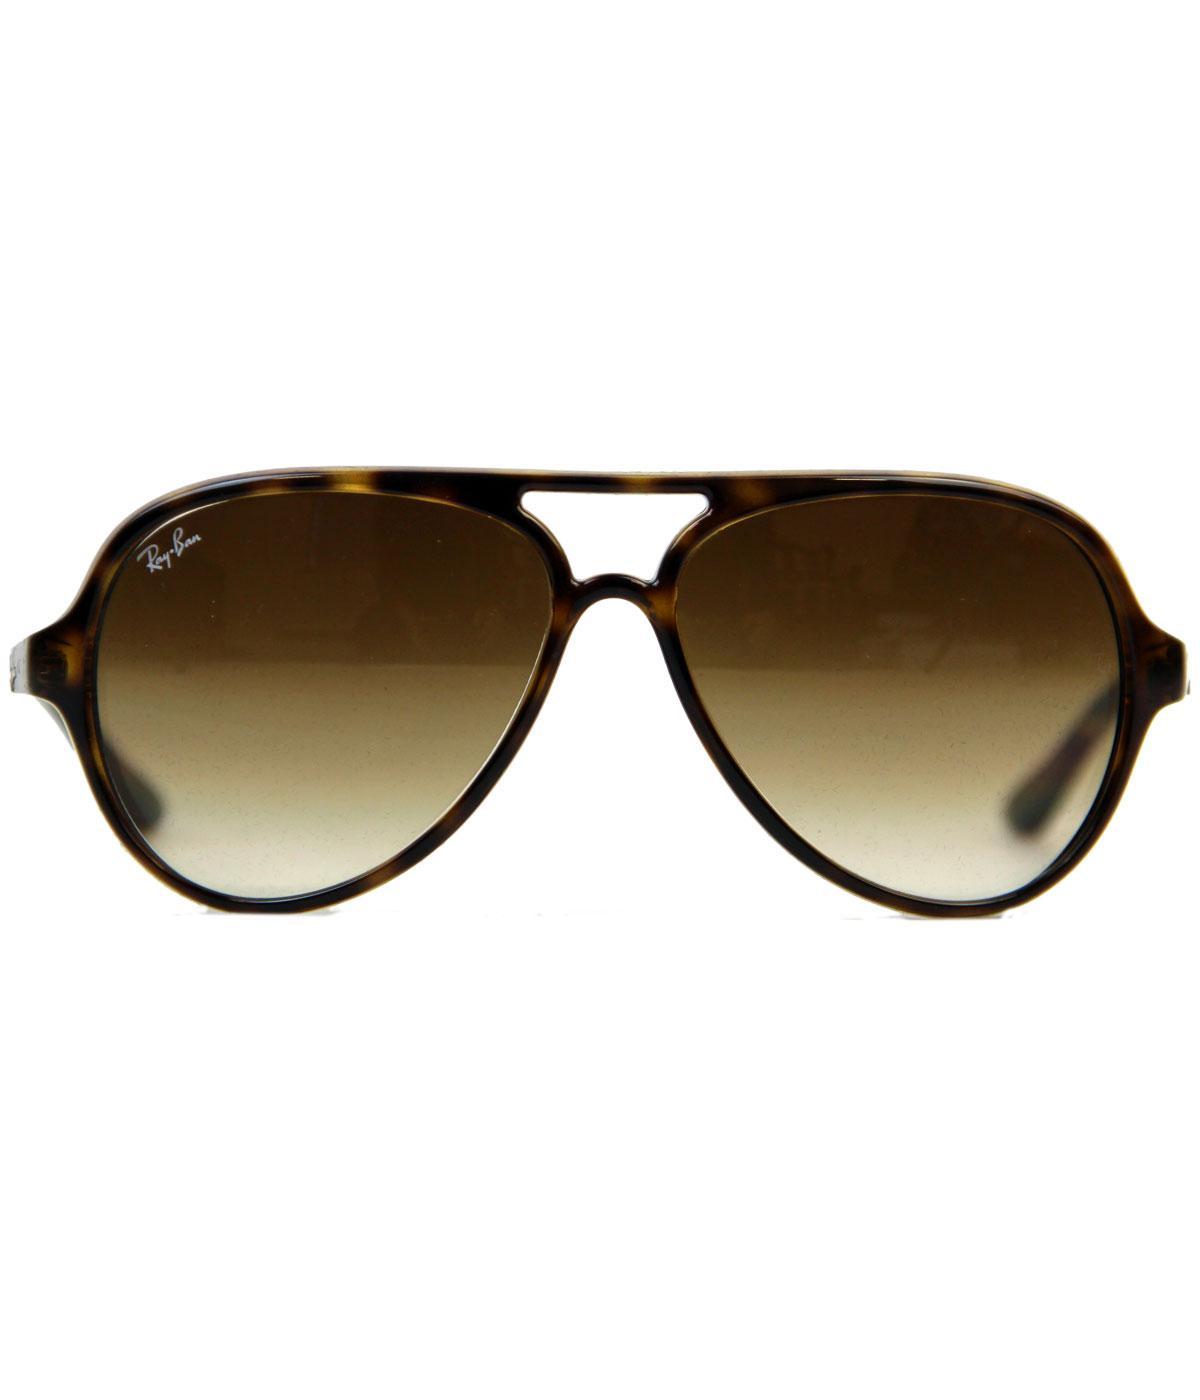 Cats 5000 Aviator Sunglasses   Ray-Ban Retro Sixties Mod Brown Shades b41448caf5b4